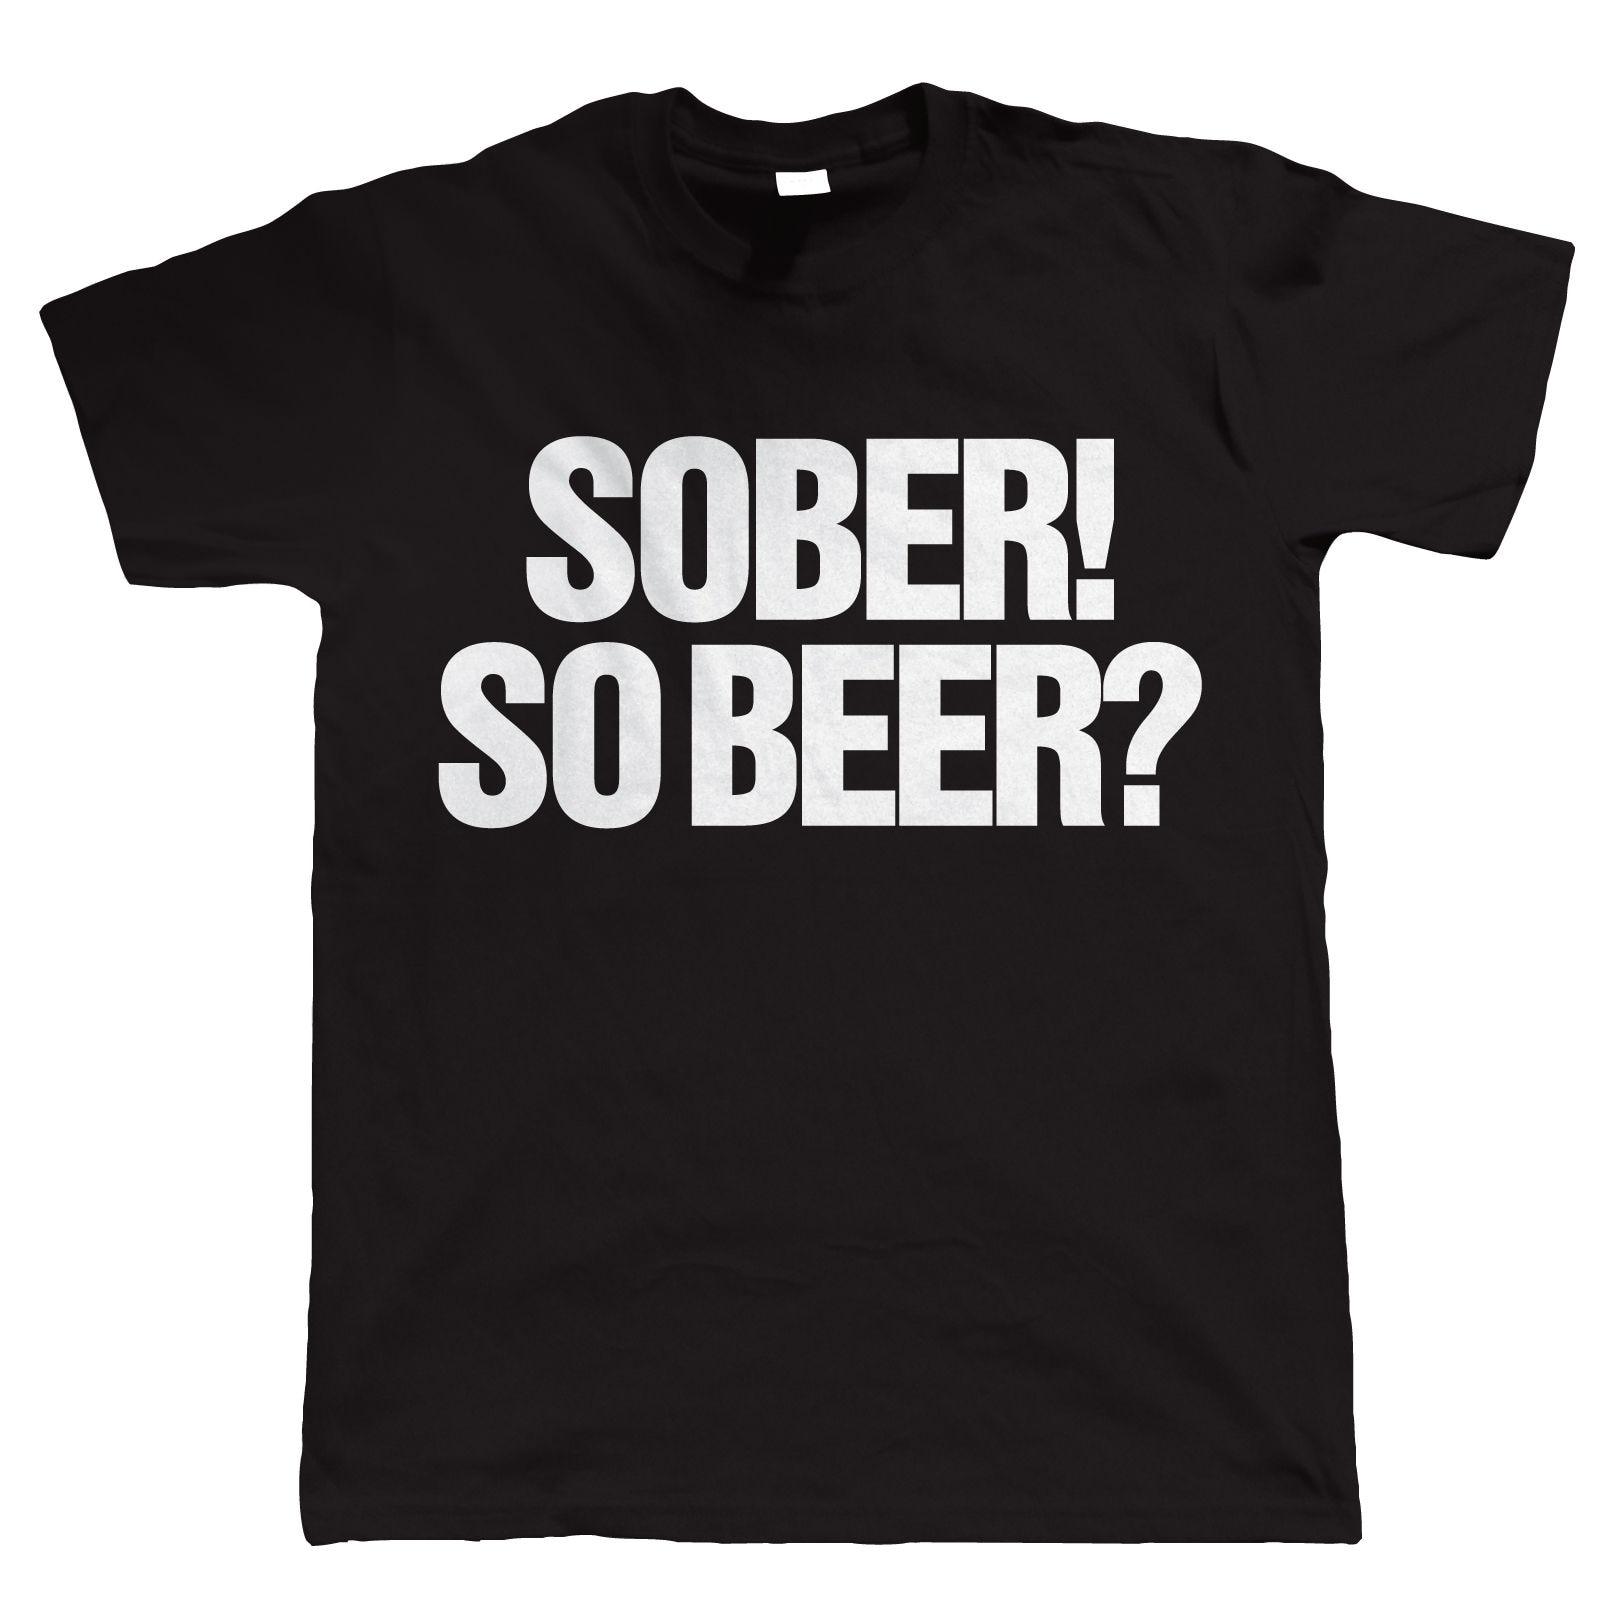 Sober So Beer, Funny Mens Drinking T Shirt 2018 New Short Sleeve Men T Shirt Sleeves Boy Cotton Men T-Shirt Top Tee